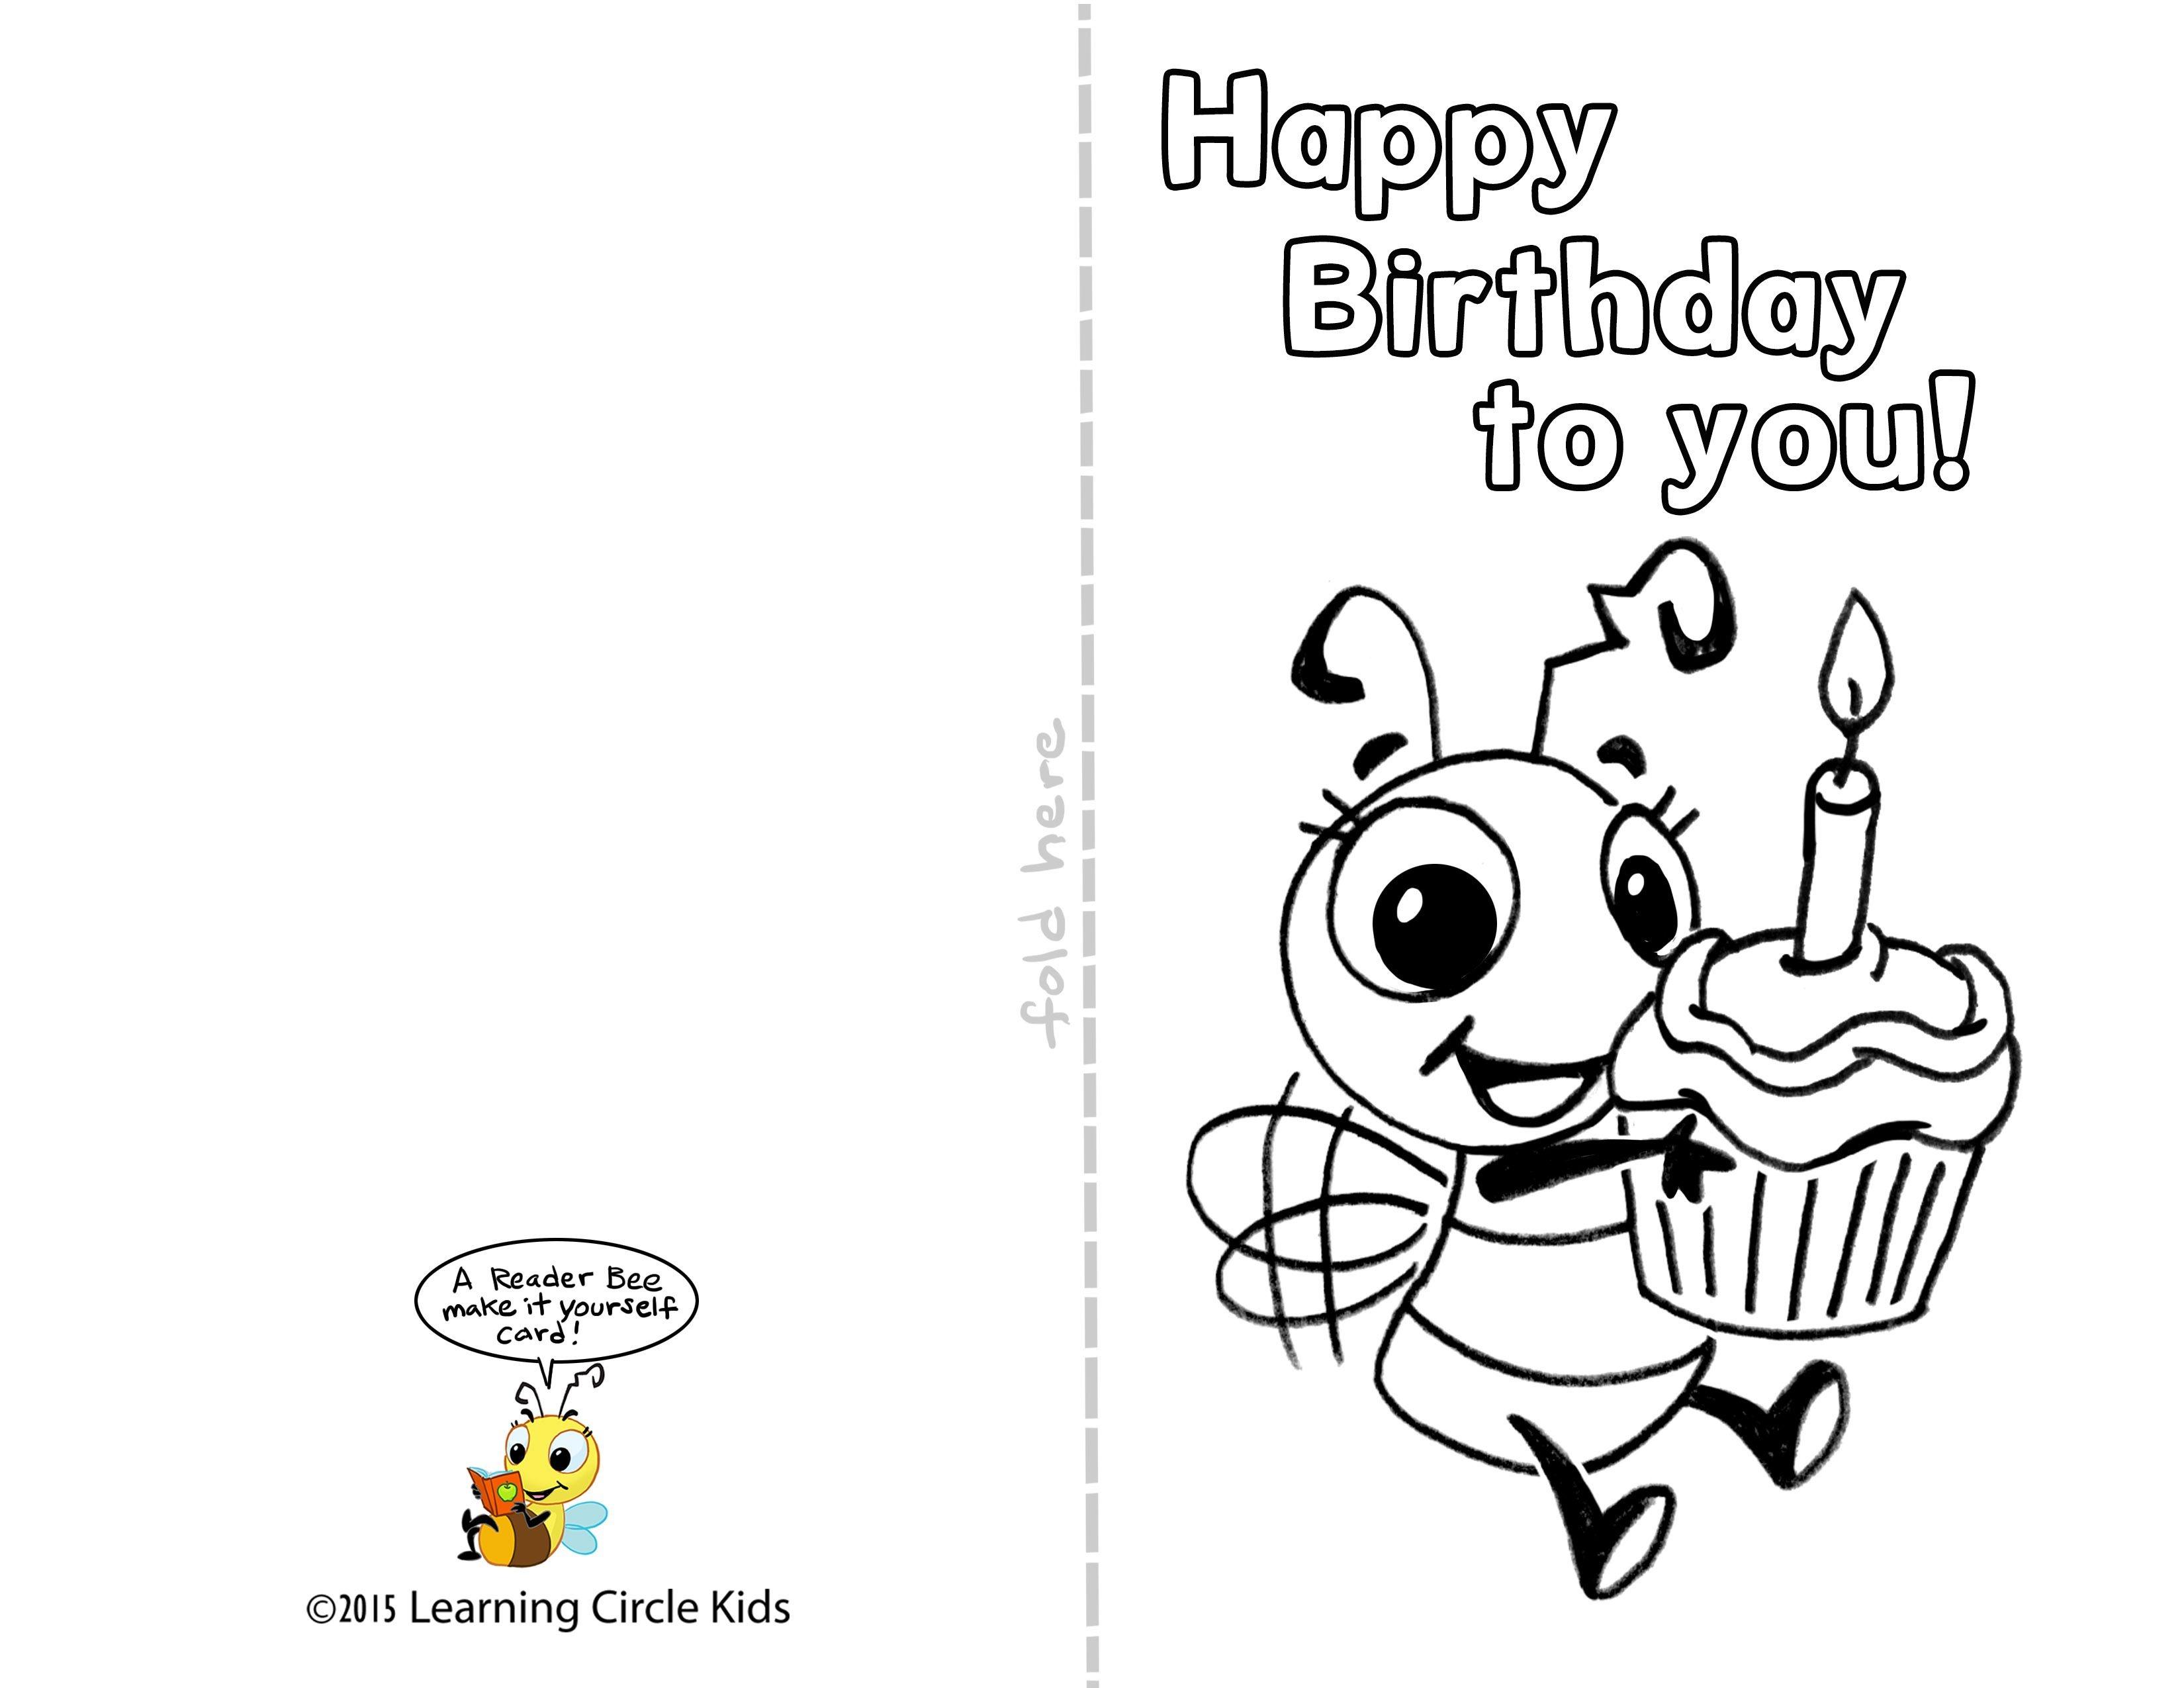 Free Printable Kids Birthday Cards Boys - Tutlin.psstech.co - Free Printable Kids Birthday Cards Boys